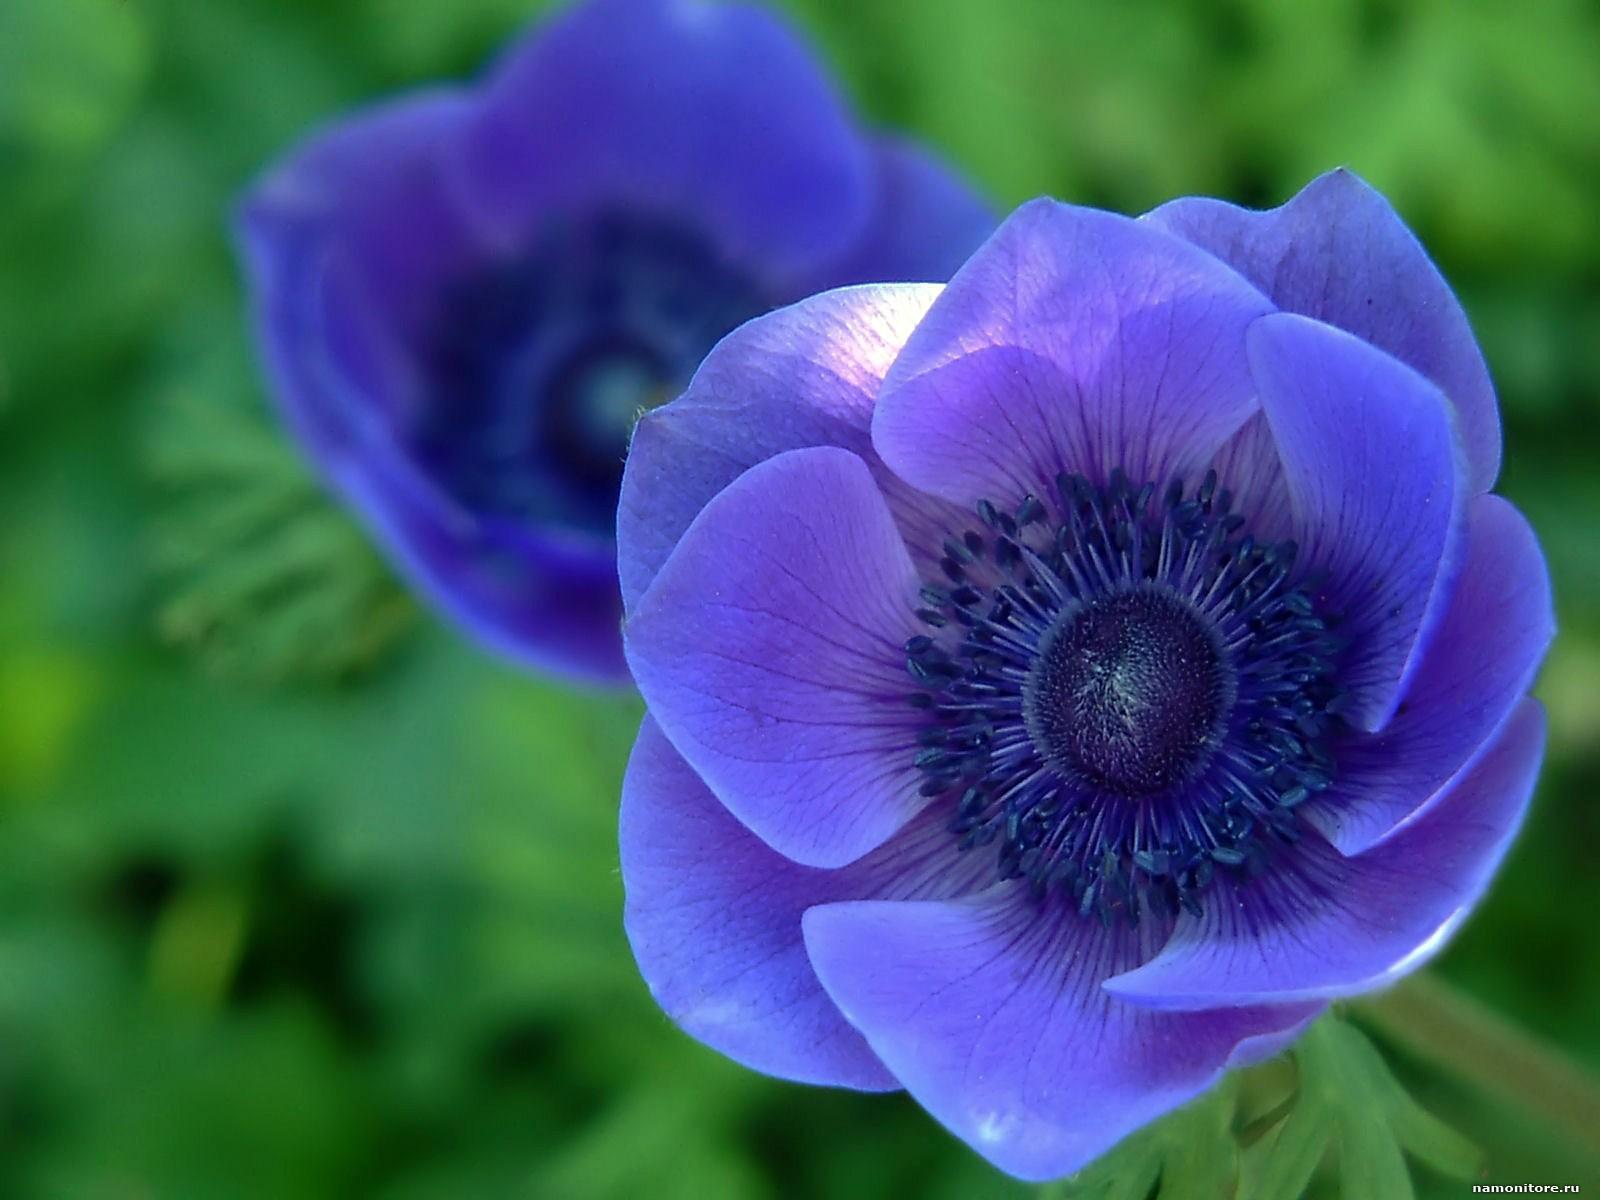 Purple blue flowers yelomphonecompany purple blue flowers izmirmasajfo